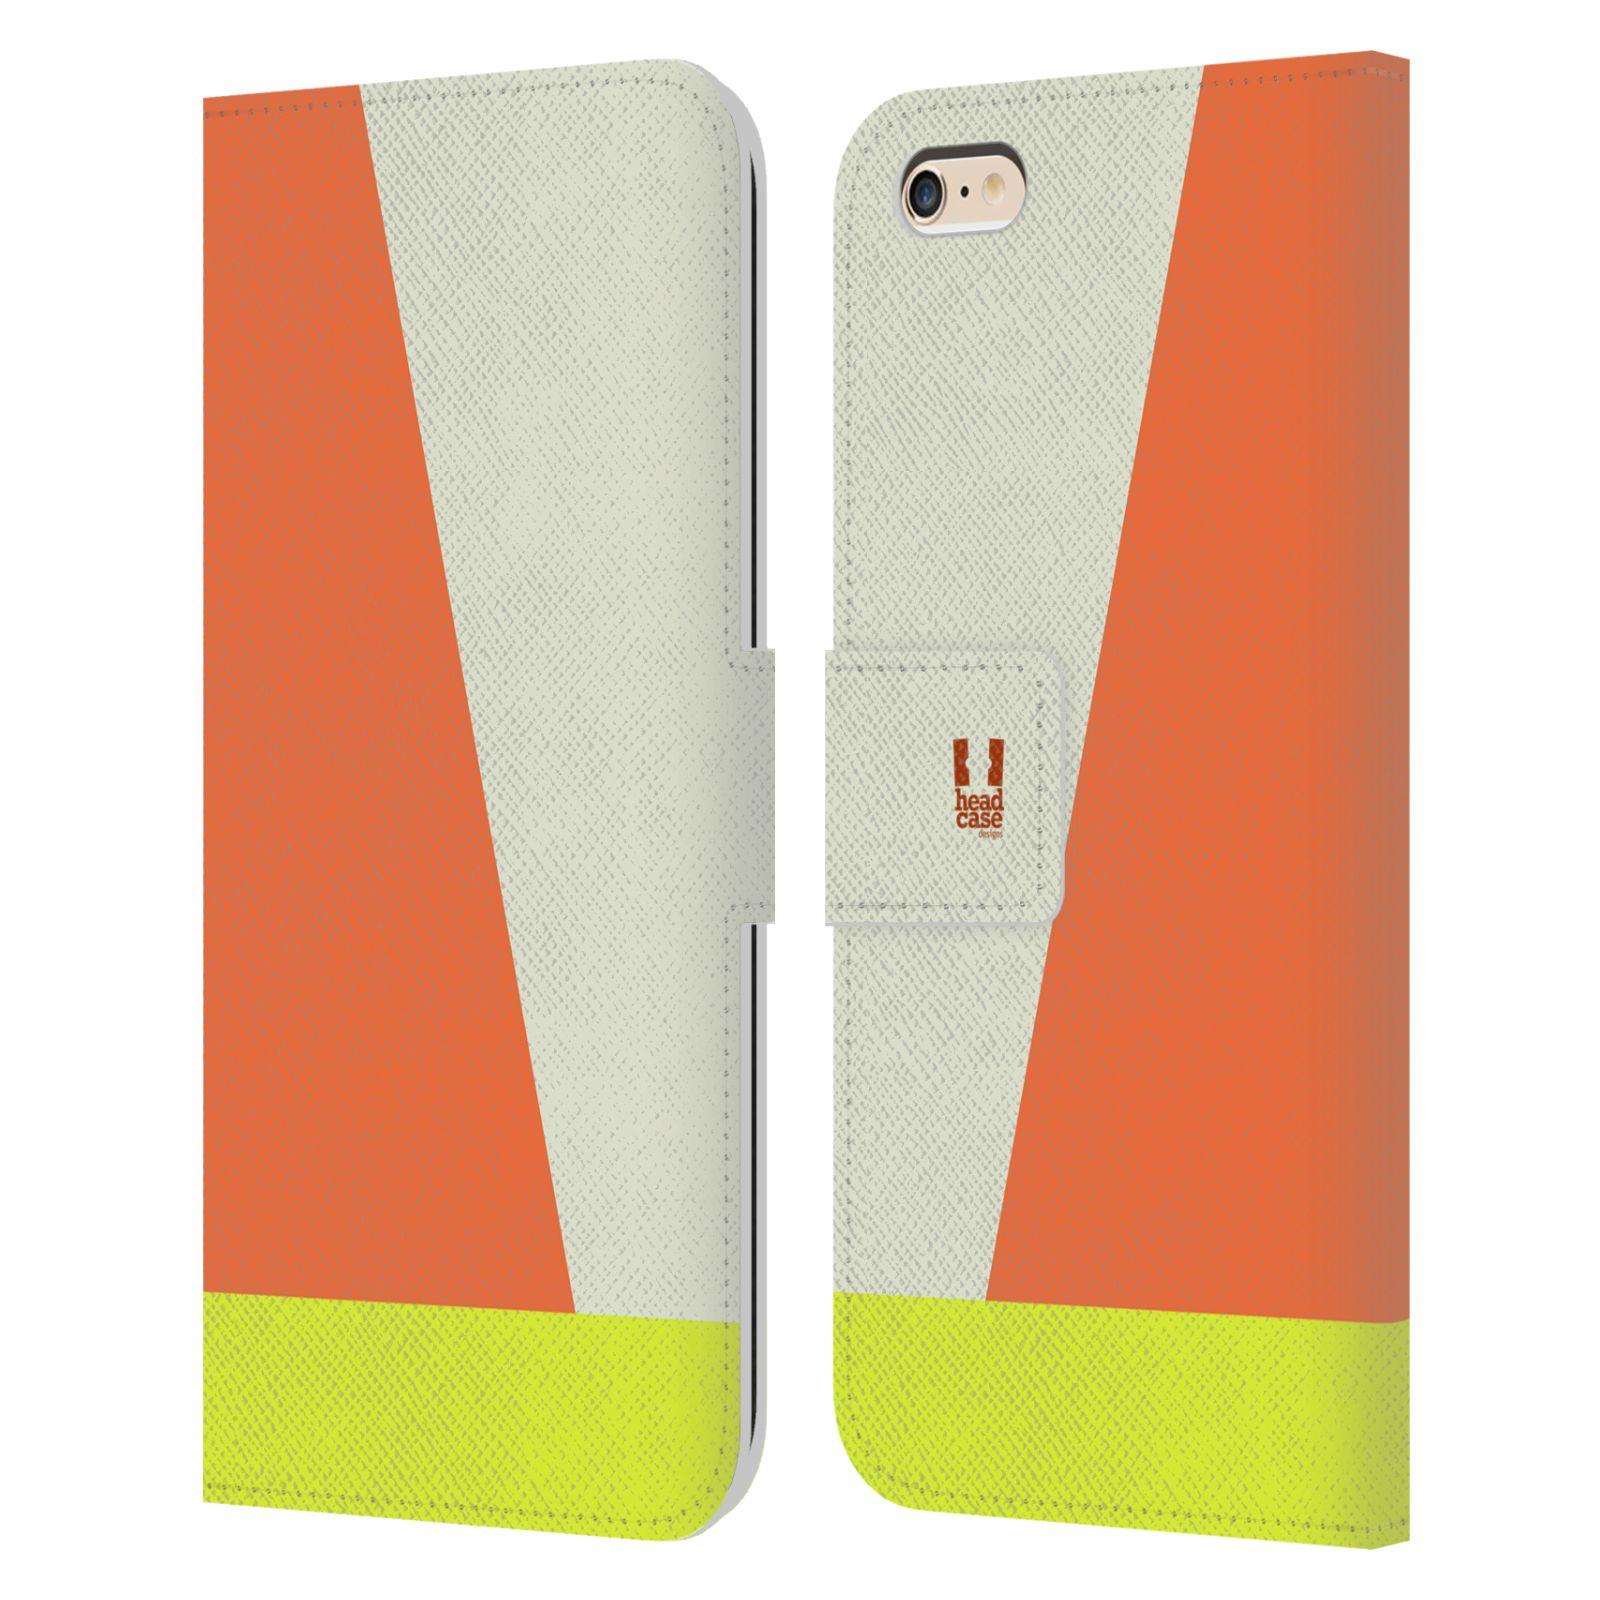 HEAD CASE Flipové pouzdro pro mobil Apple Iphone 6 PLUS/6S PLUS barevné tvary slonová kost